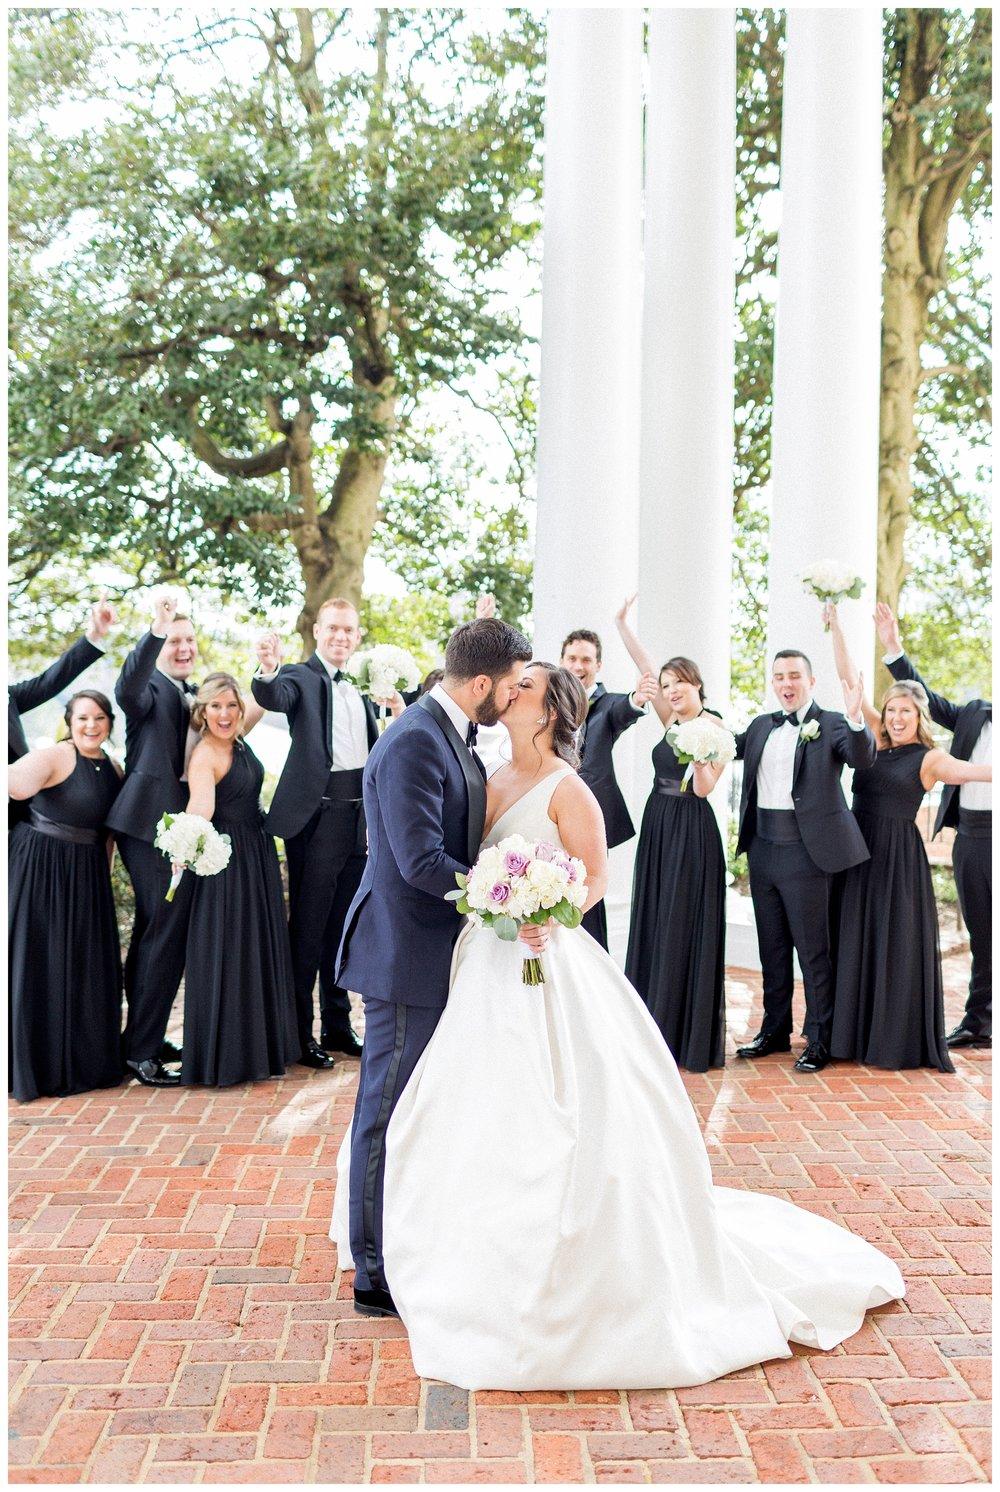 Country Club of Virginia Wedding | Richmond Wedding Photographer_0089.jpg